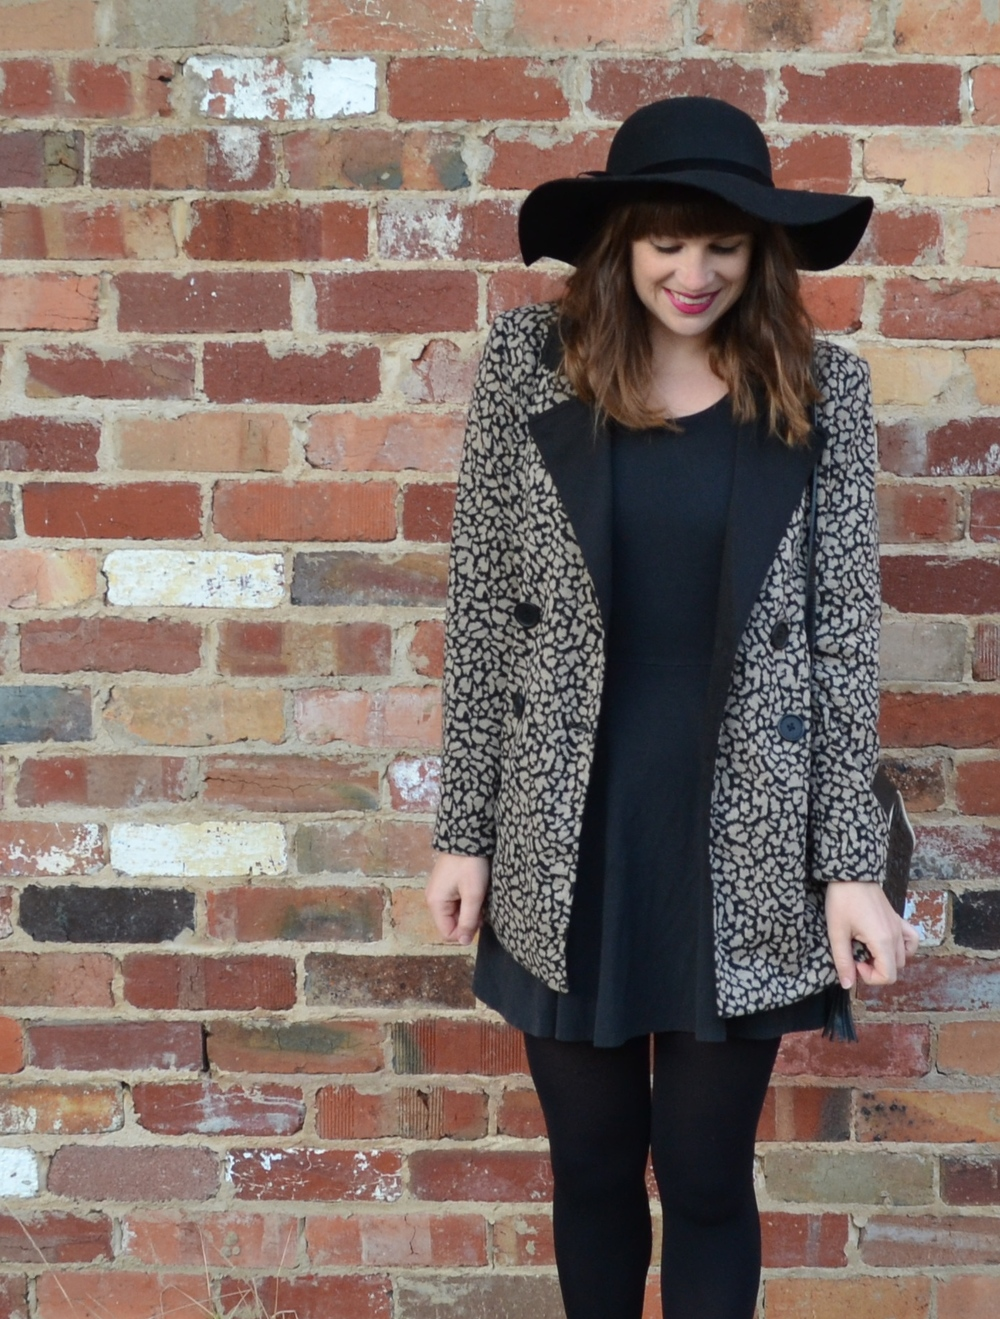 black-felt-floppy-hat-statement-winter-coat